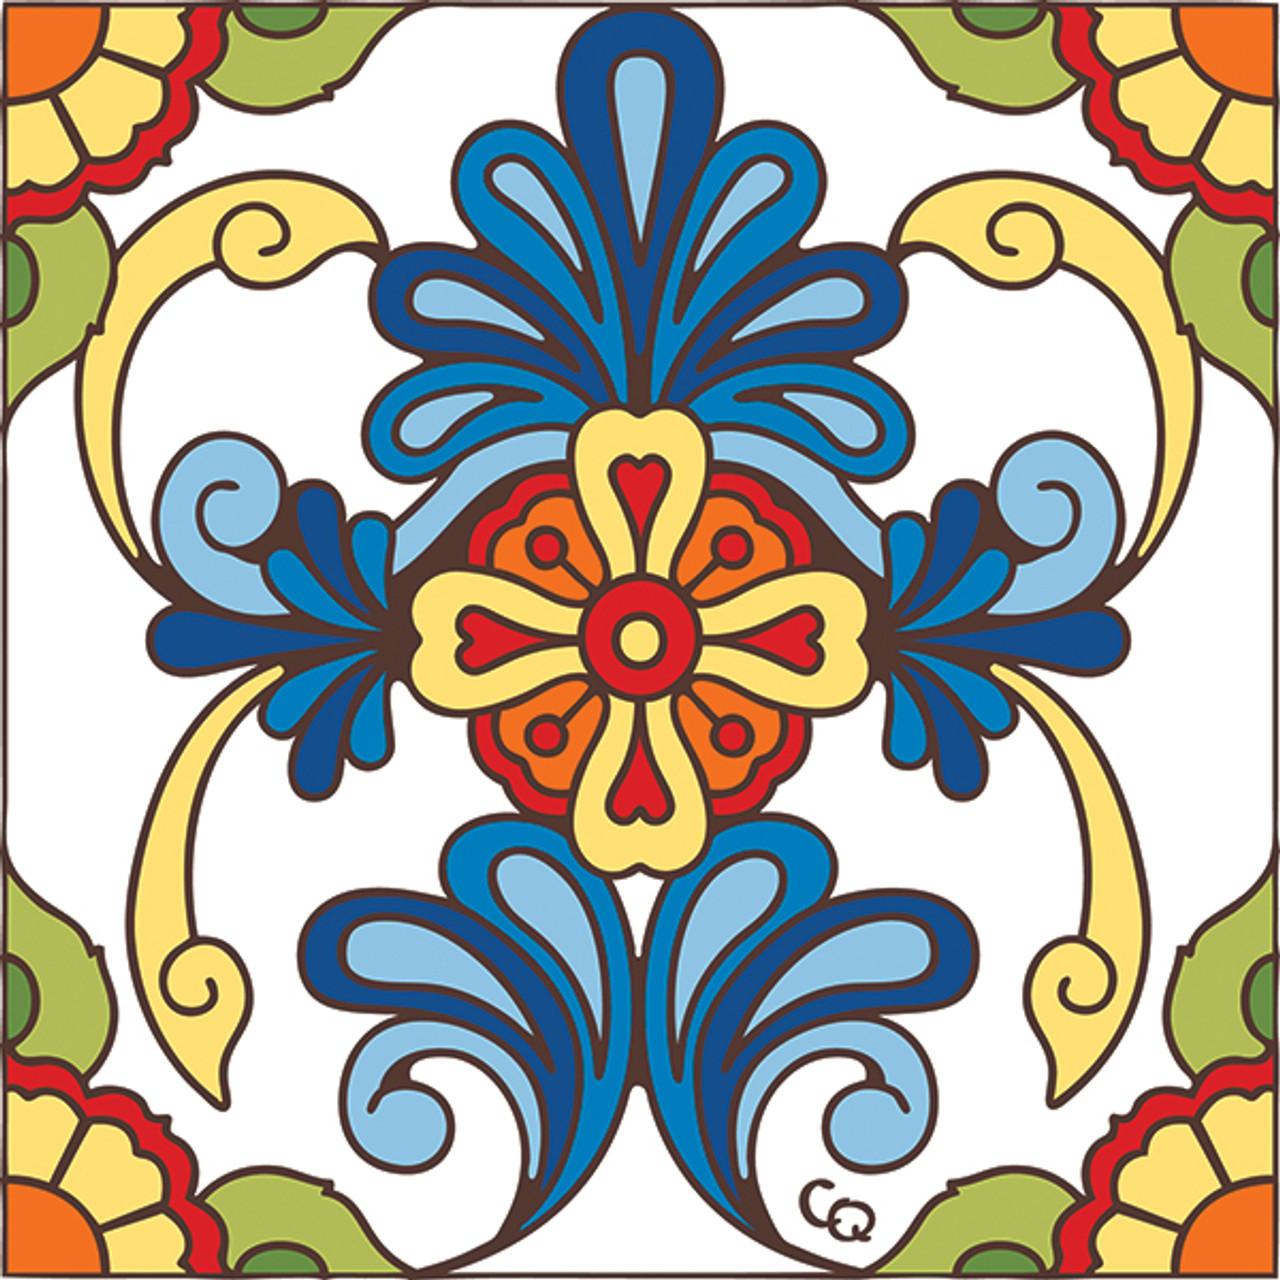 6x6 tile blue talavera design